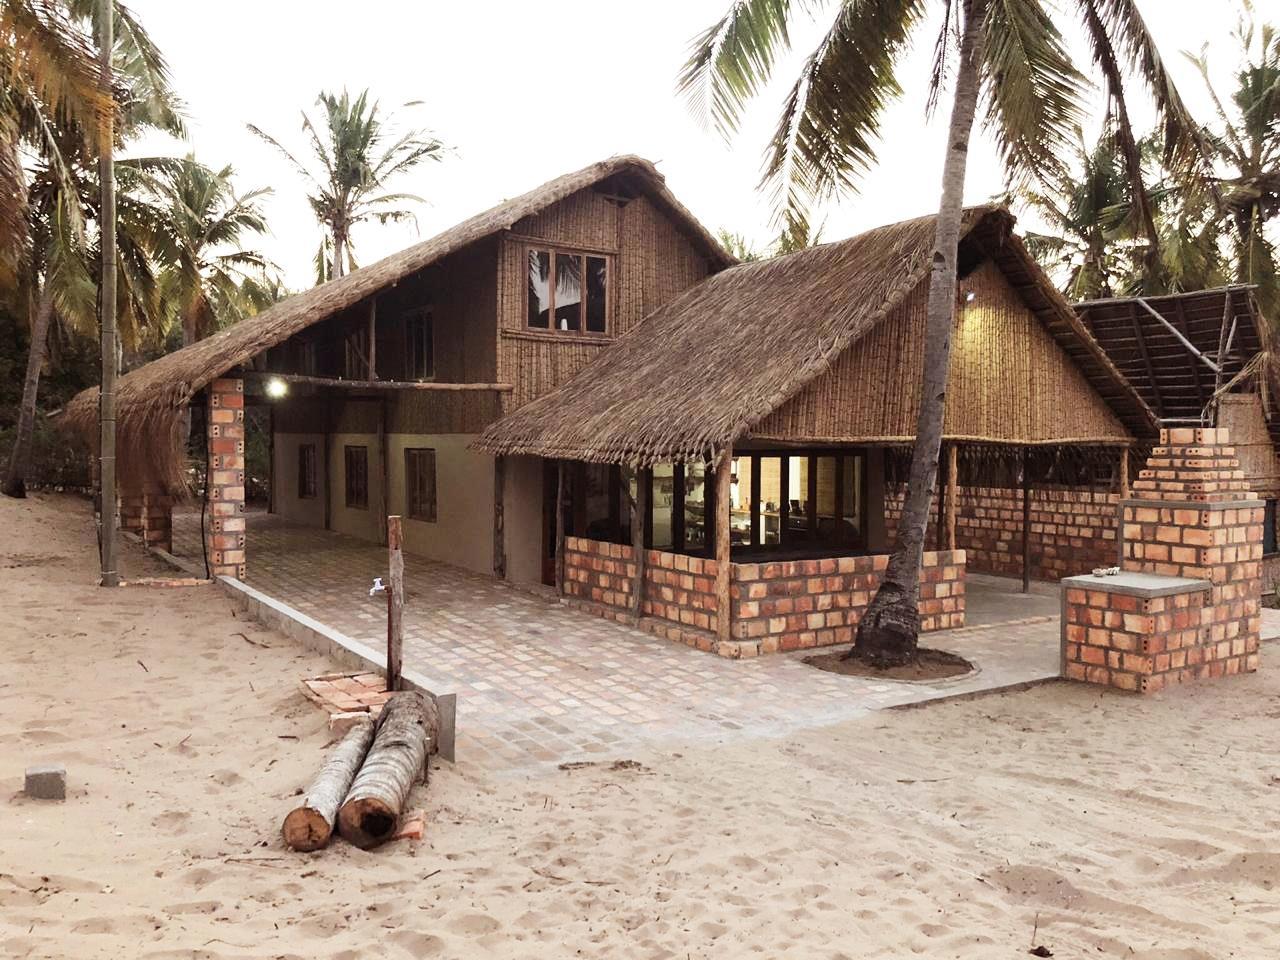 4 Bedroom House For Sale in Inhambane City Central